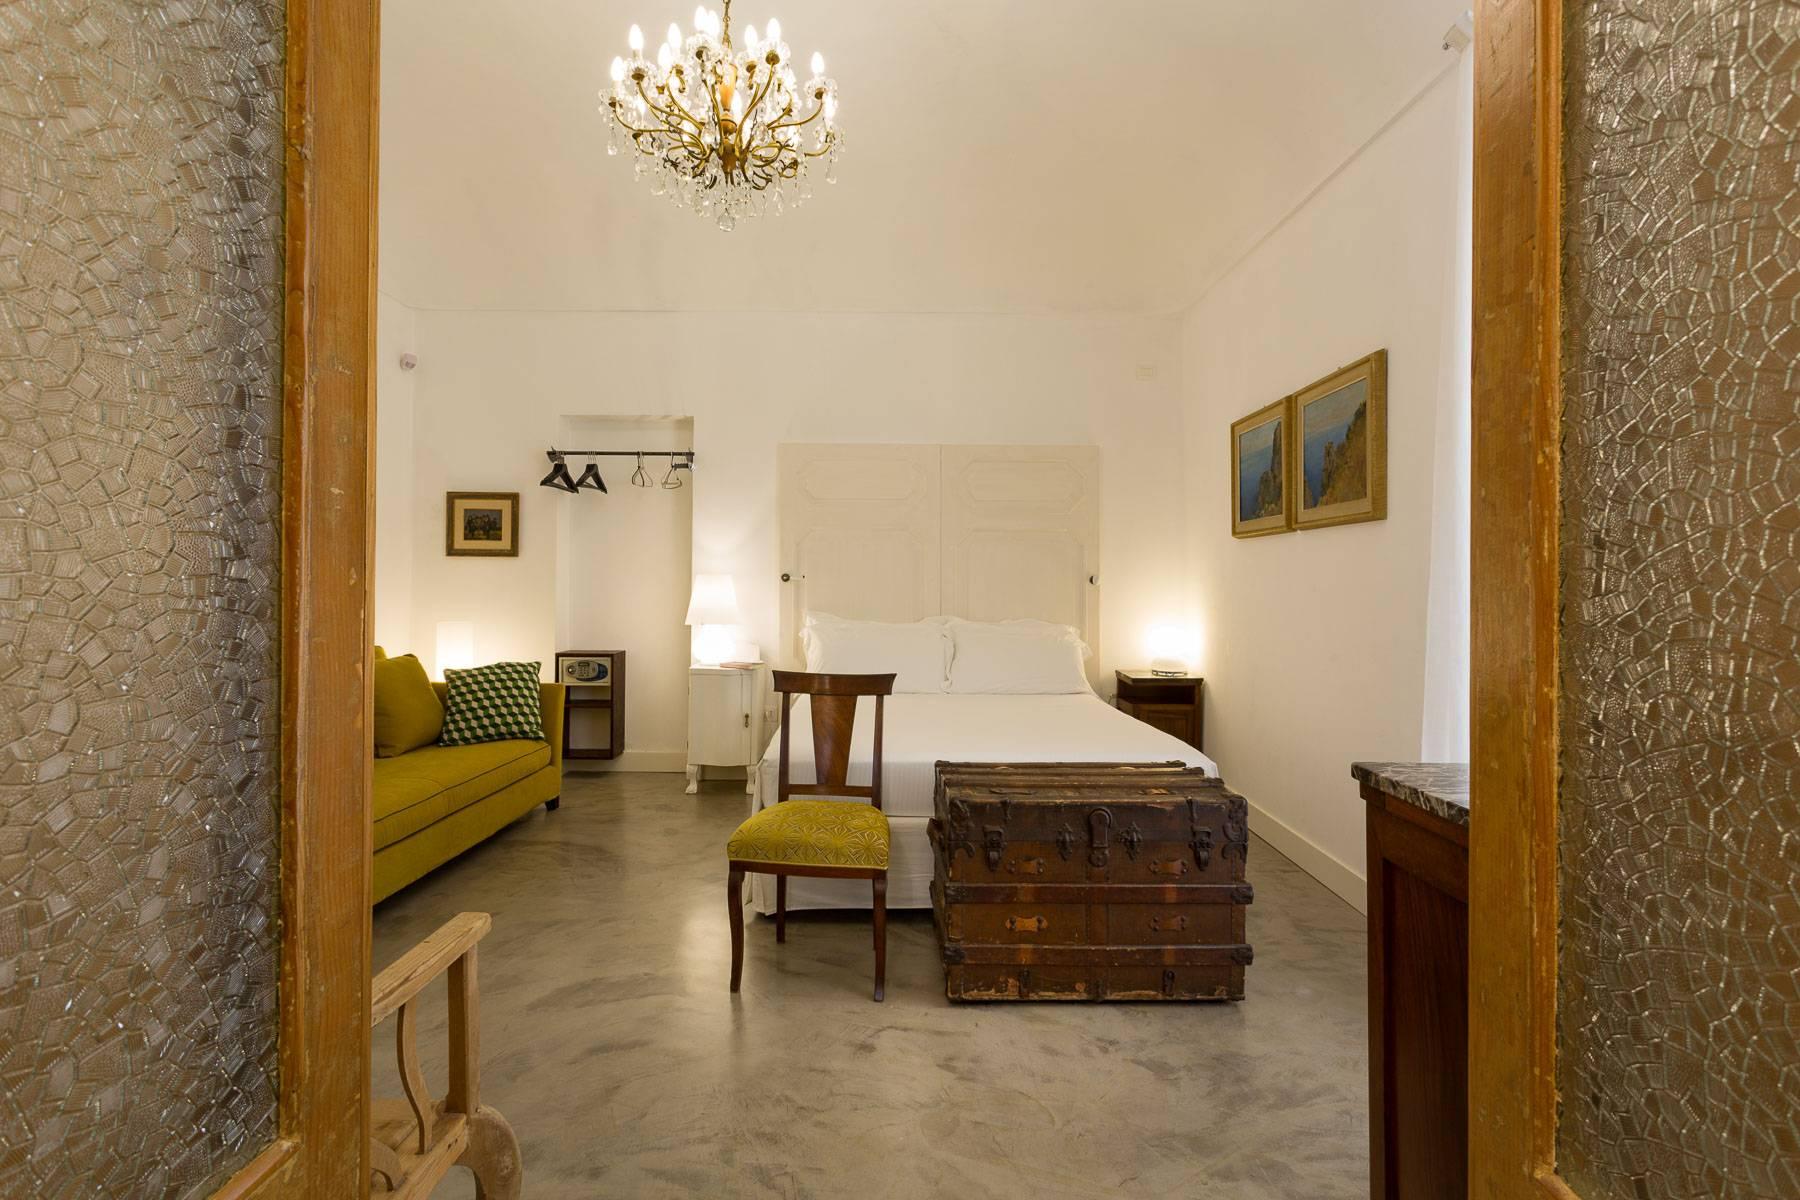 Casa indipendente in Vendita a Noto: 5 locali, 171 mq - Foto 22